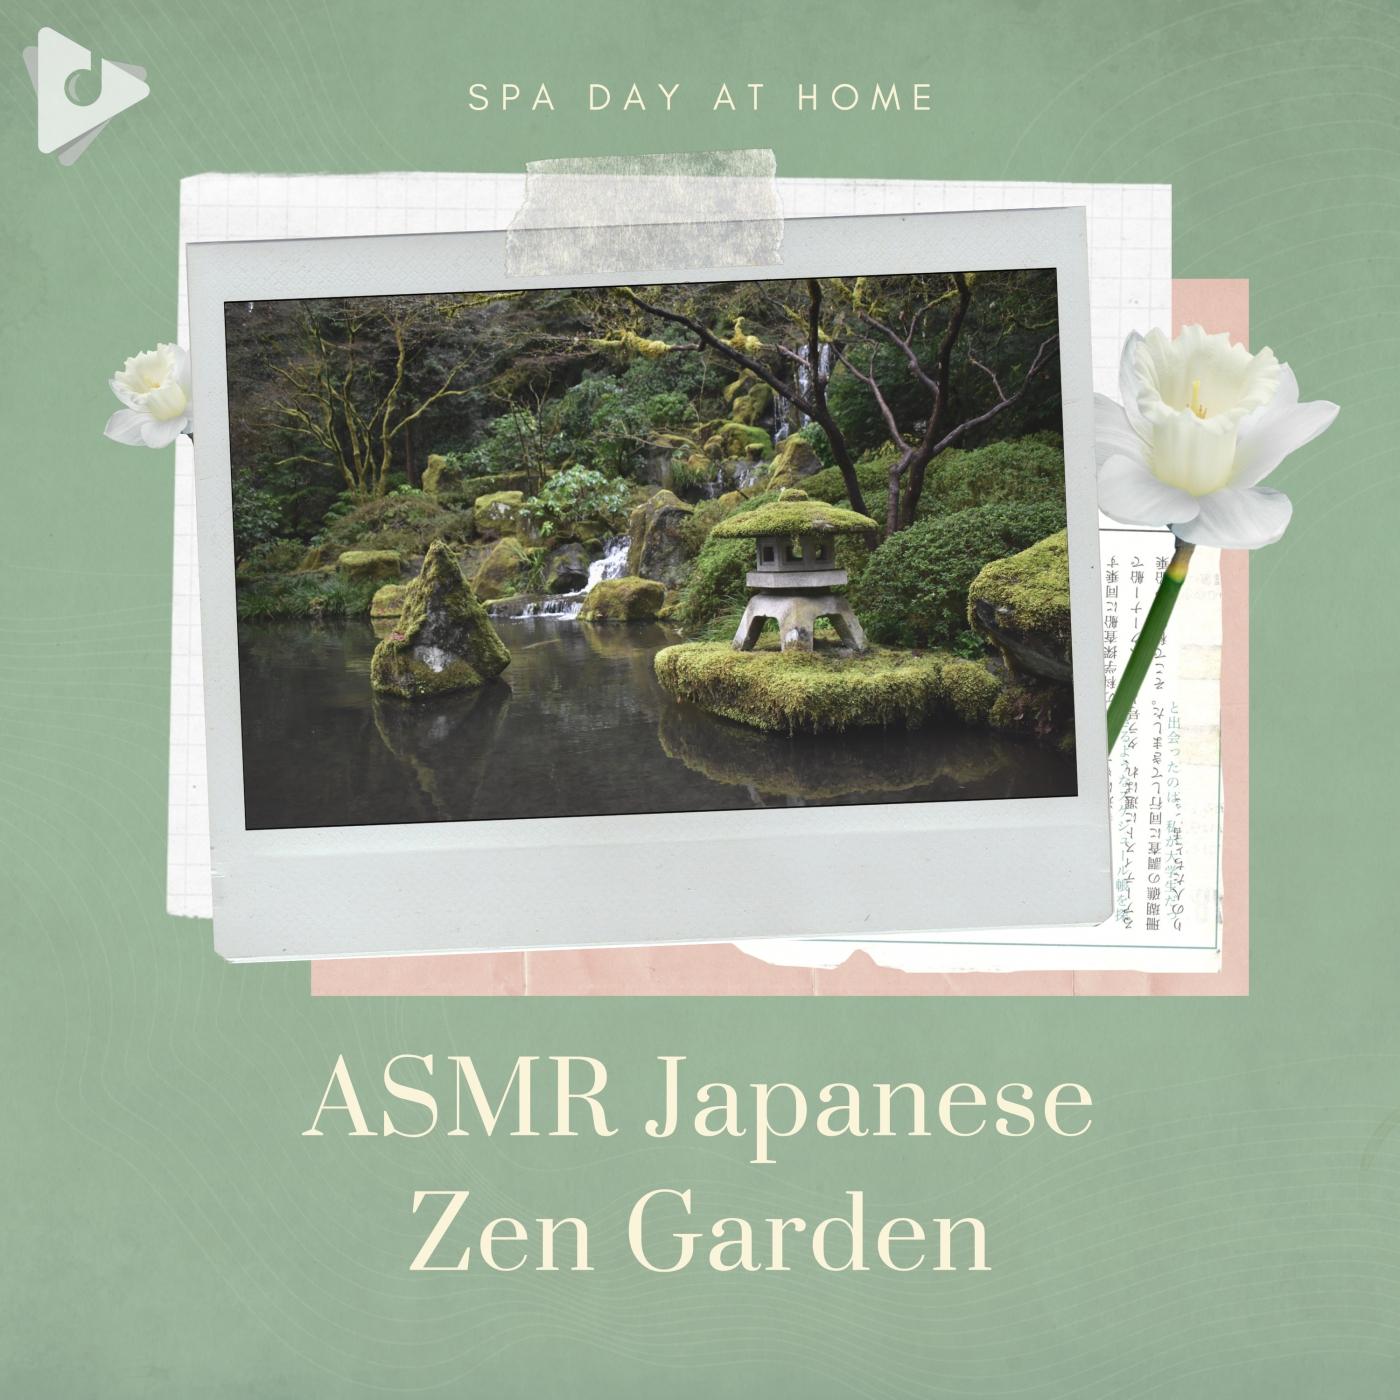 ASMR Japanese Zen Garden